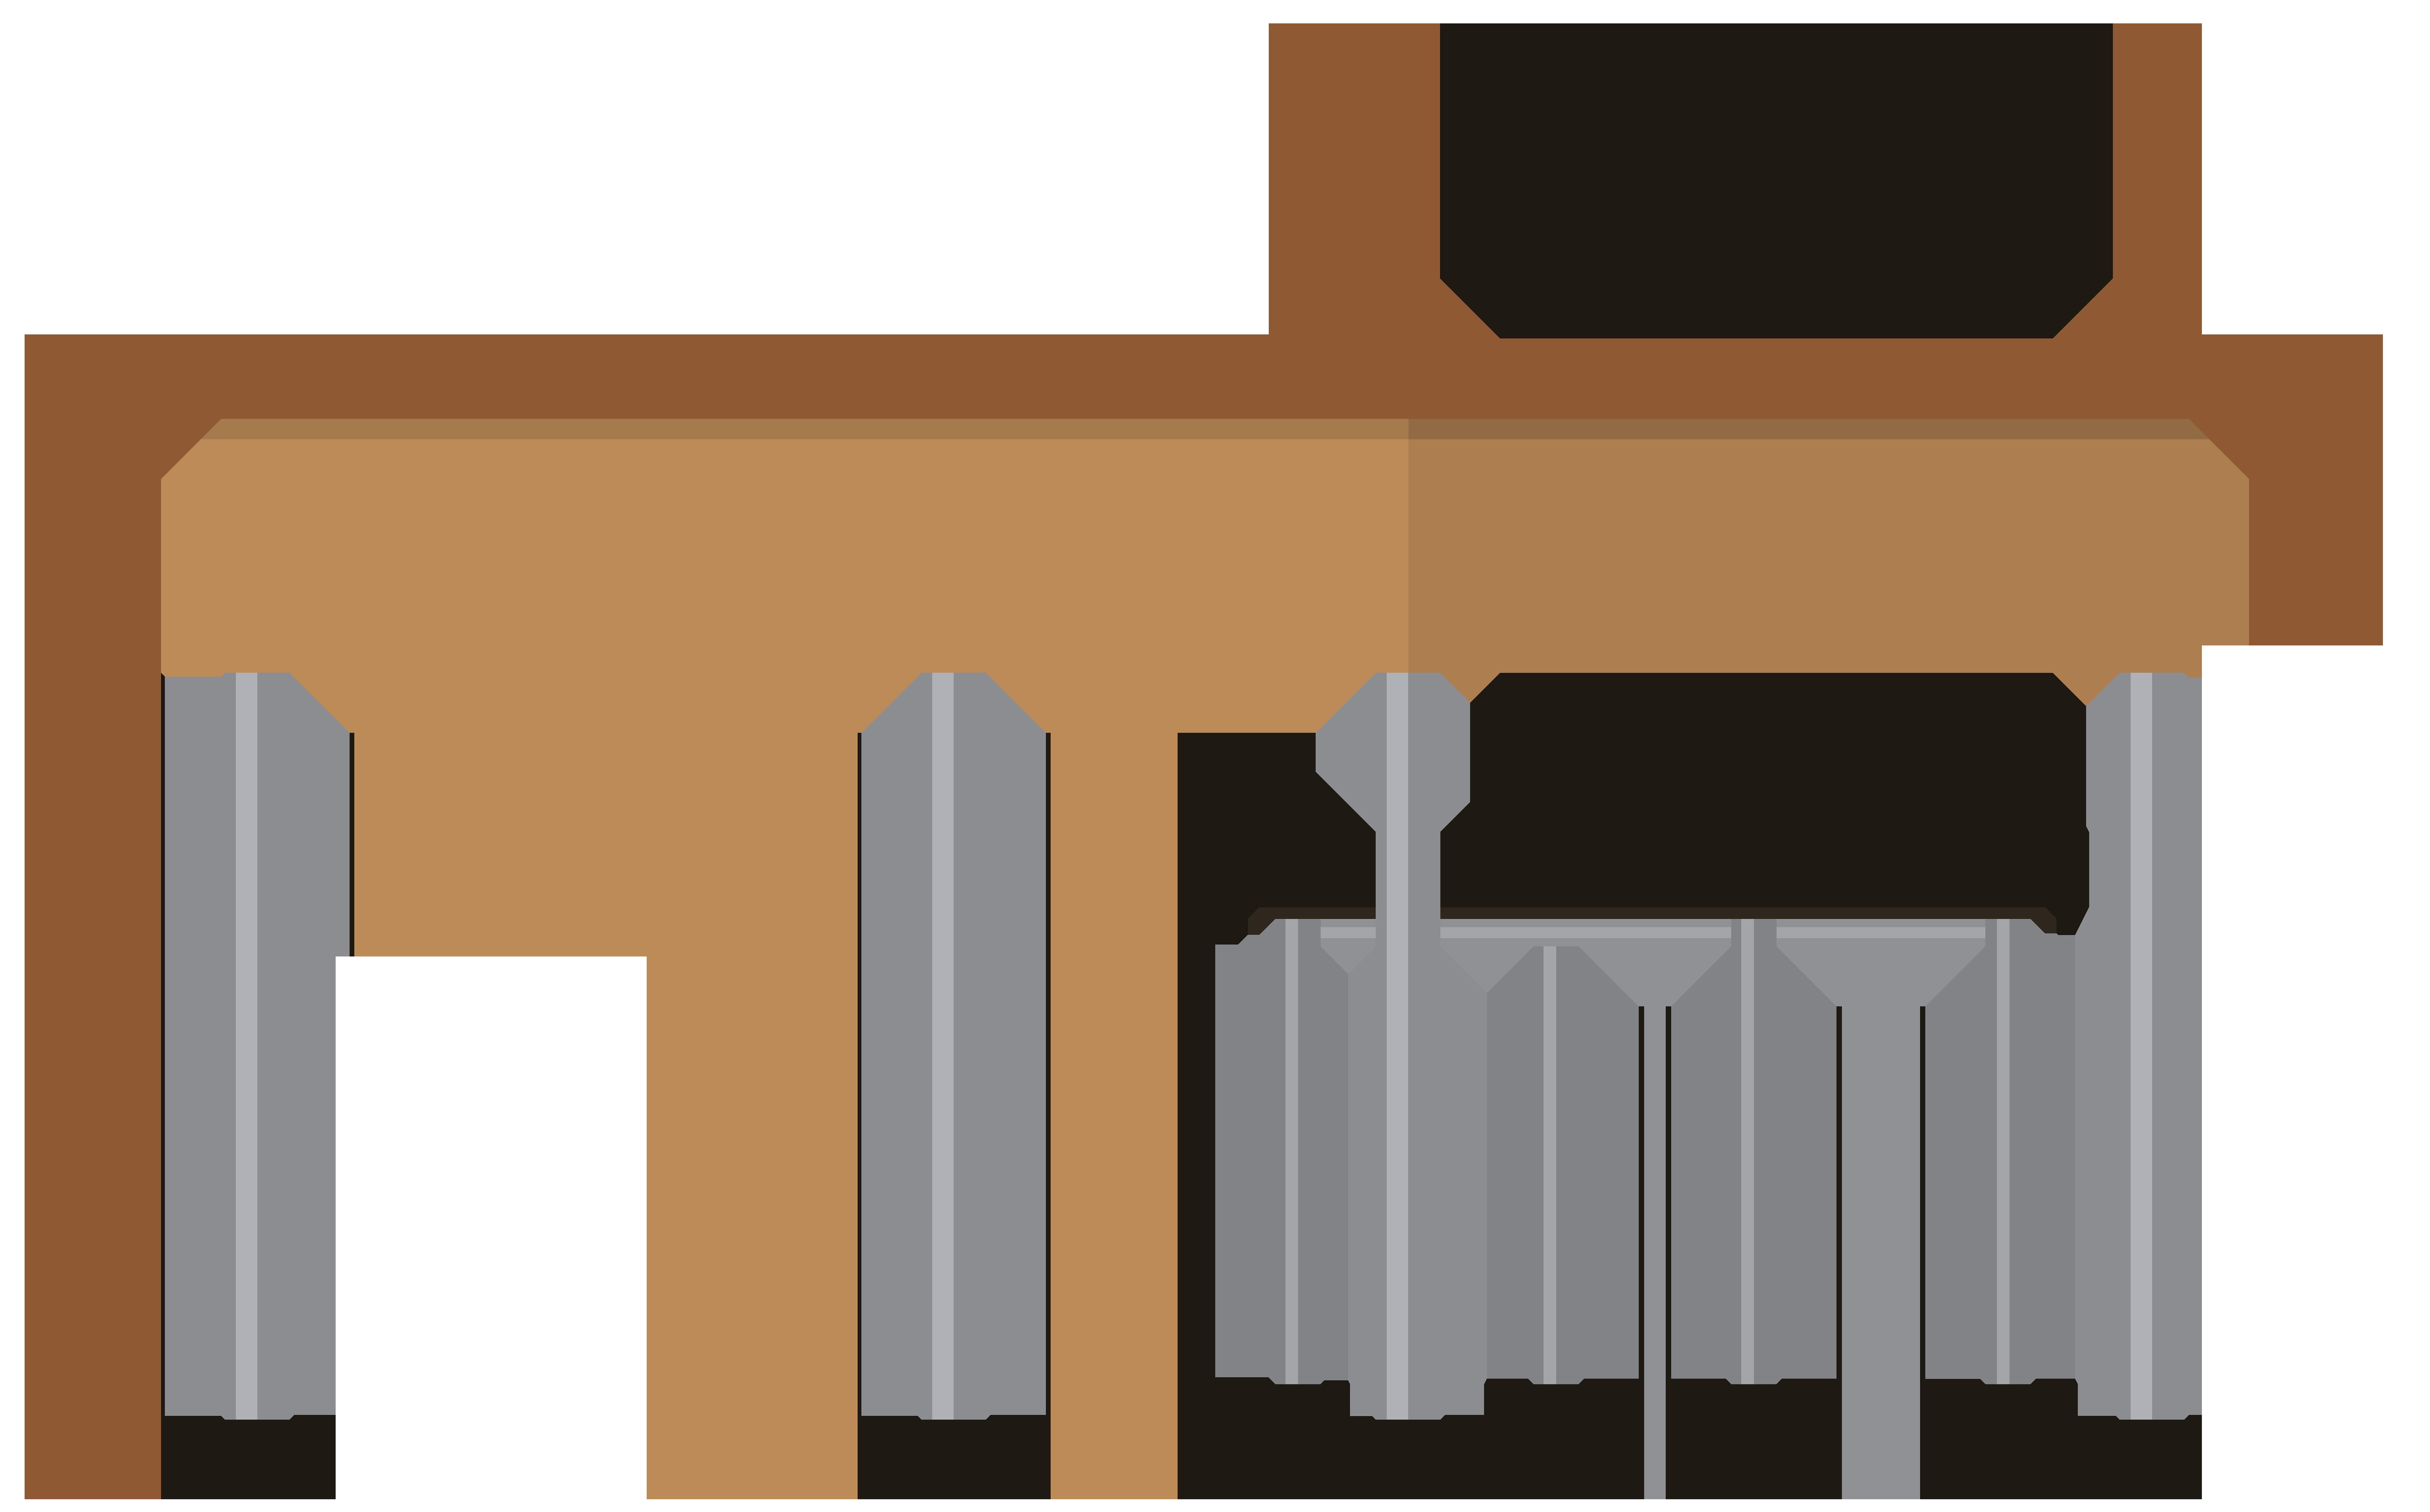 School Desks Clipart | Free download on ClipArtMag